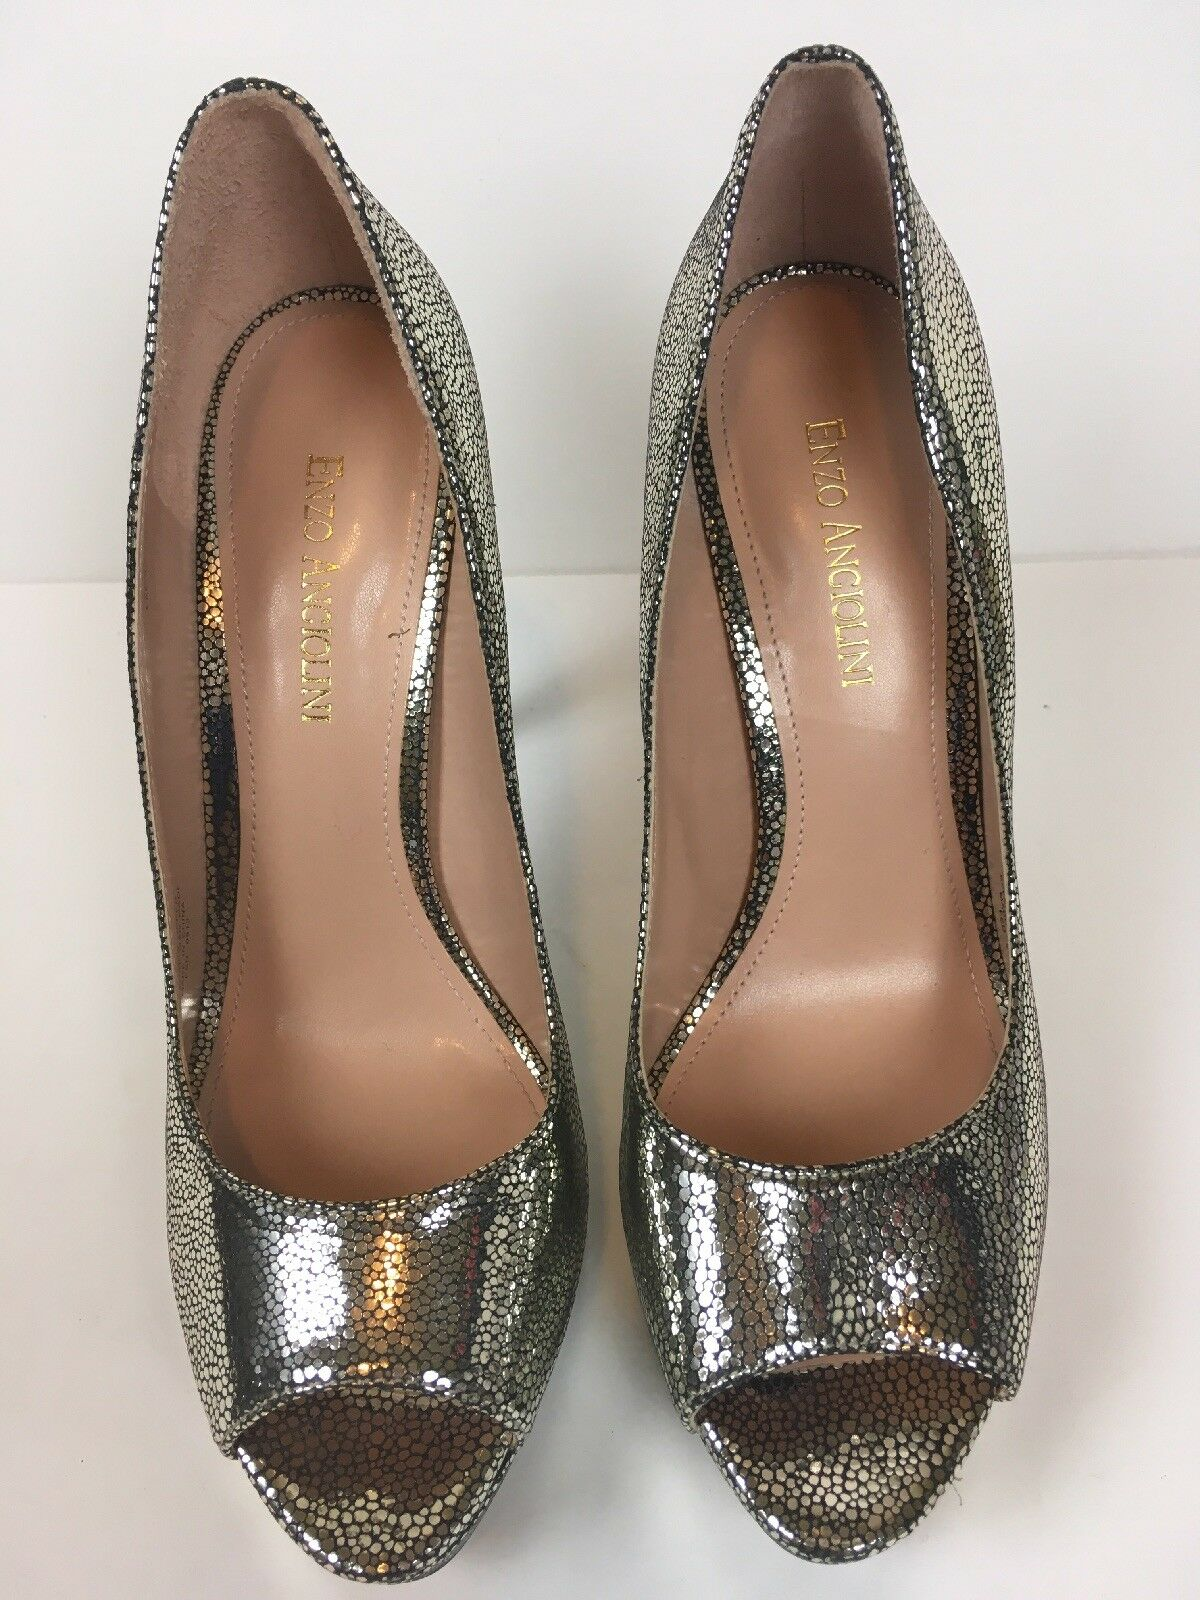 Enzo Platform Angiolini Womens Peep Toe Pumps Platform Enzo Heels Shoes Size 8.5 d9e710